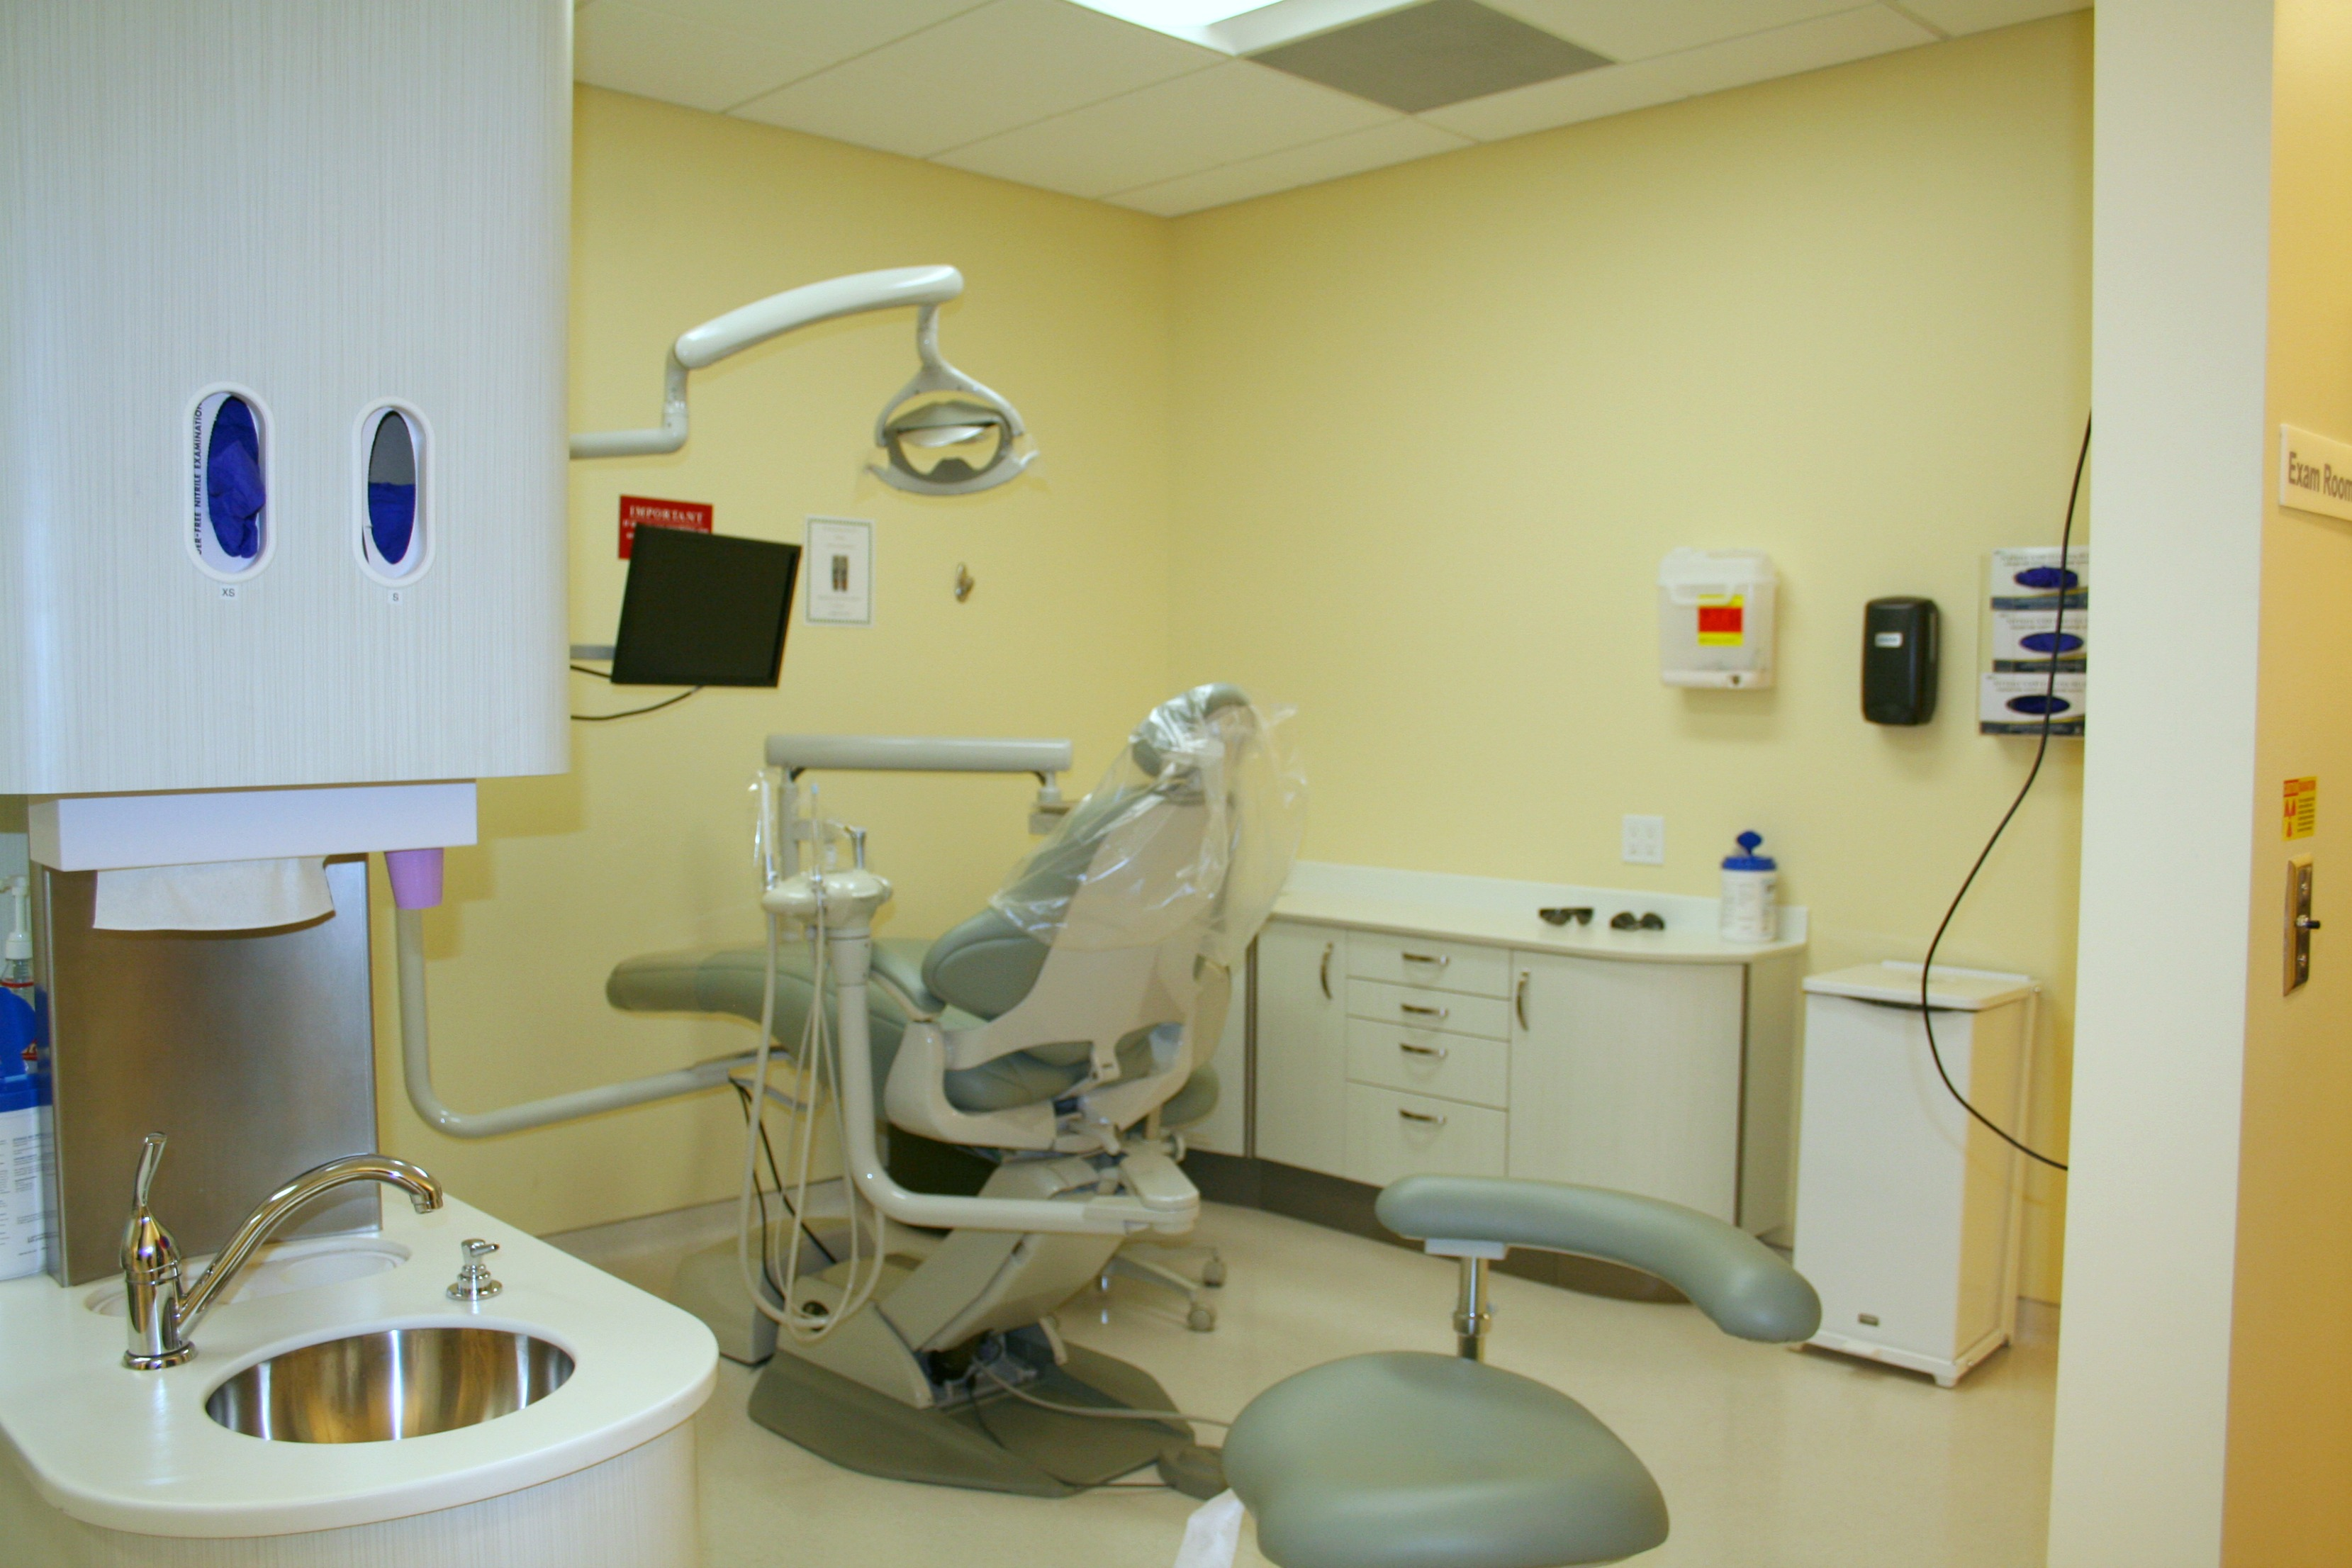 General Contractor Builds Los Angeles Medical Dental Facility Construction